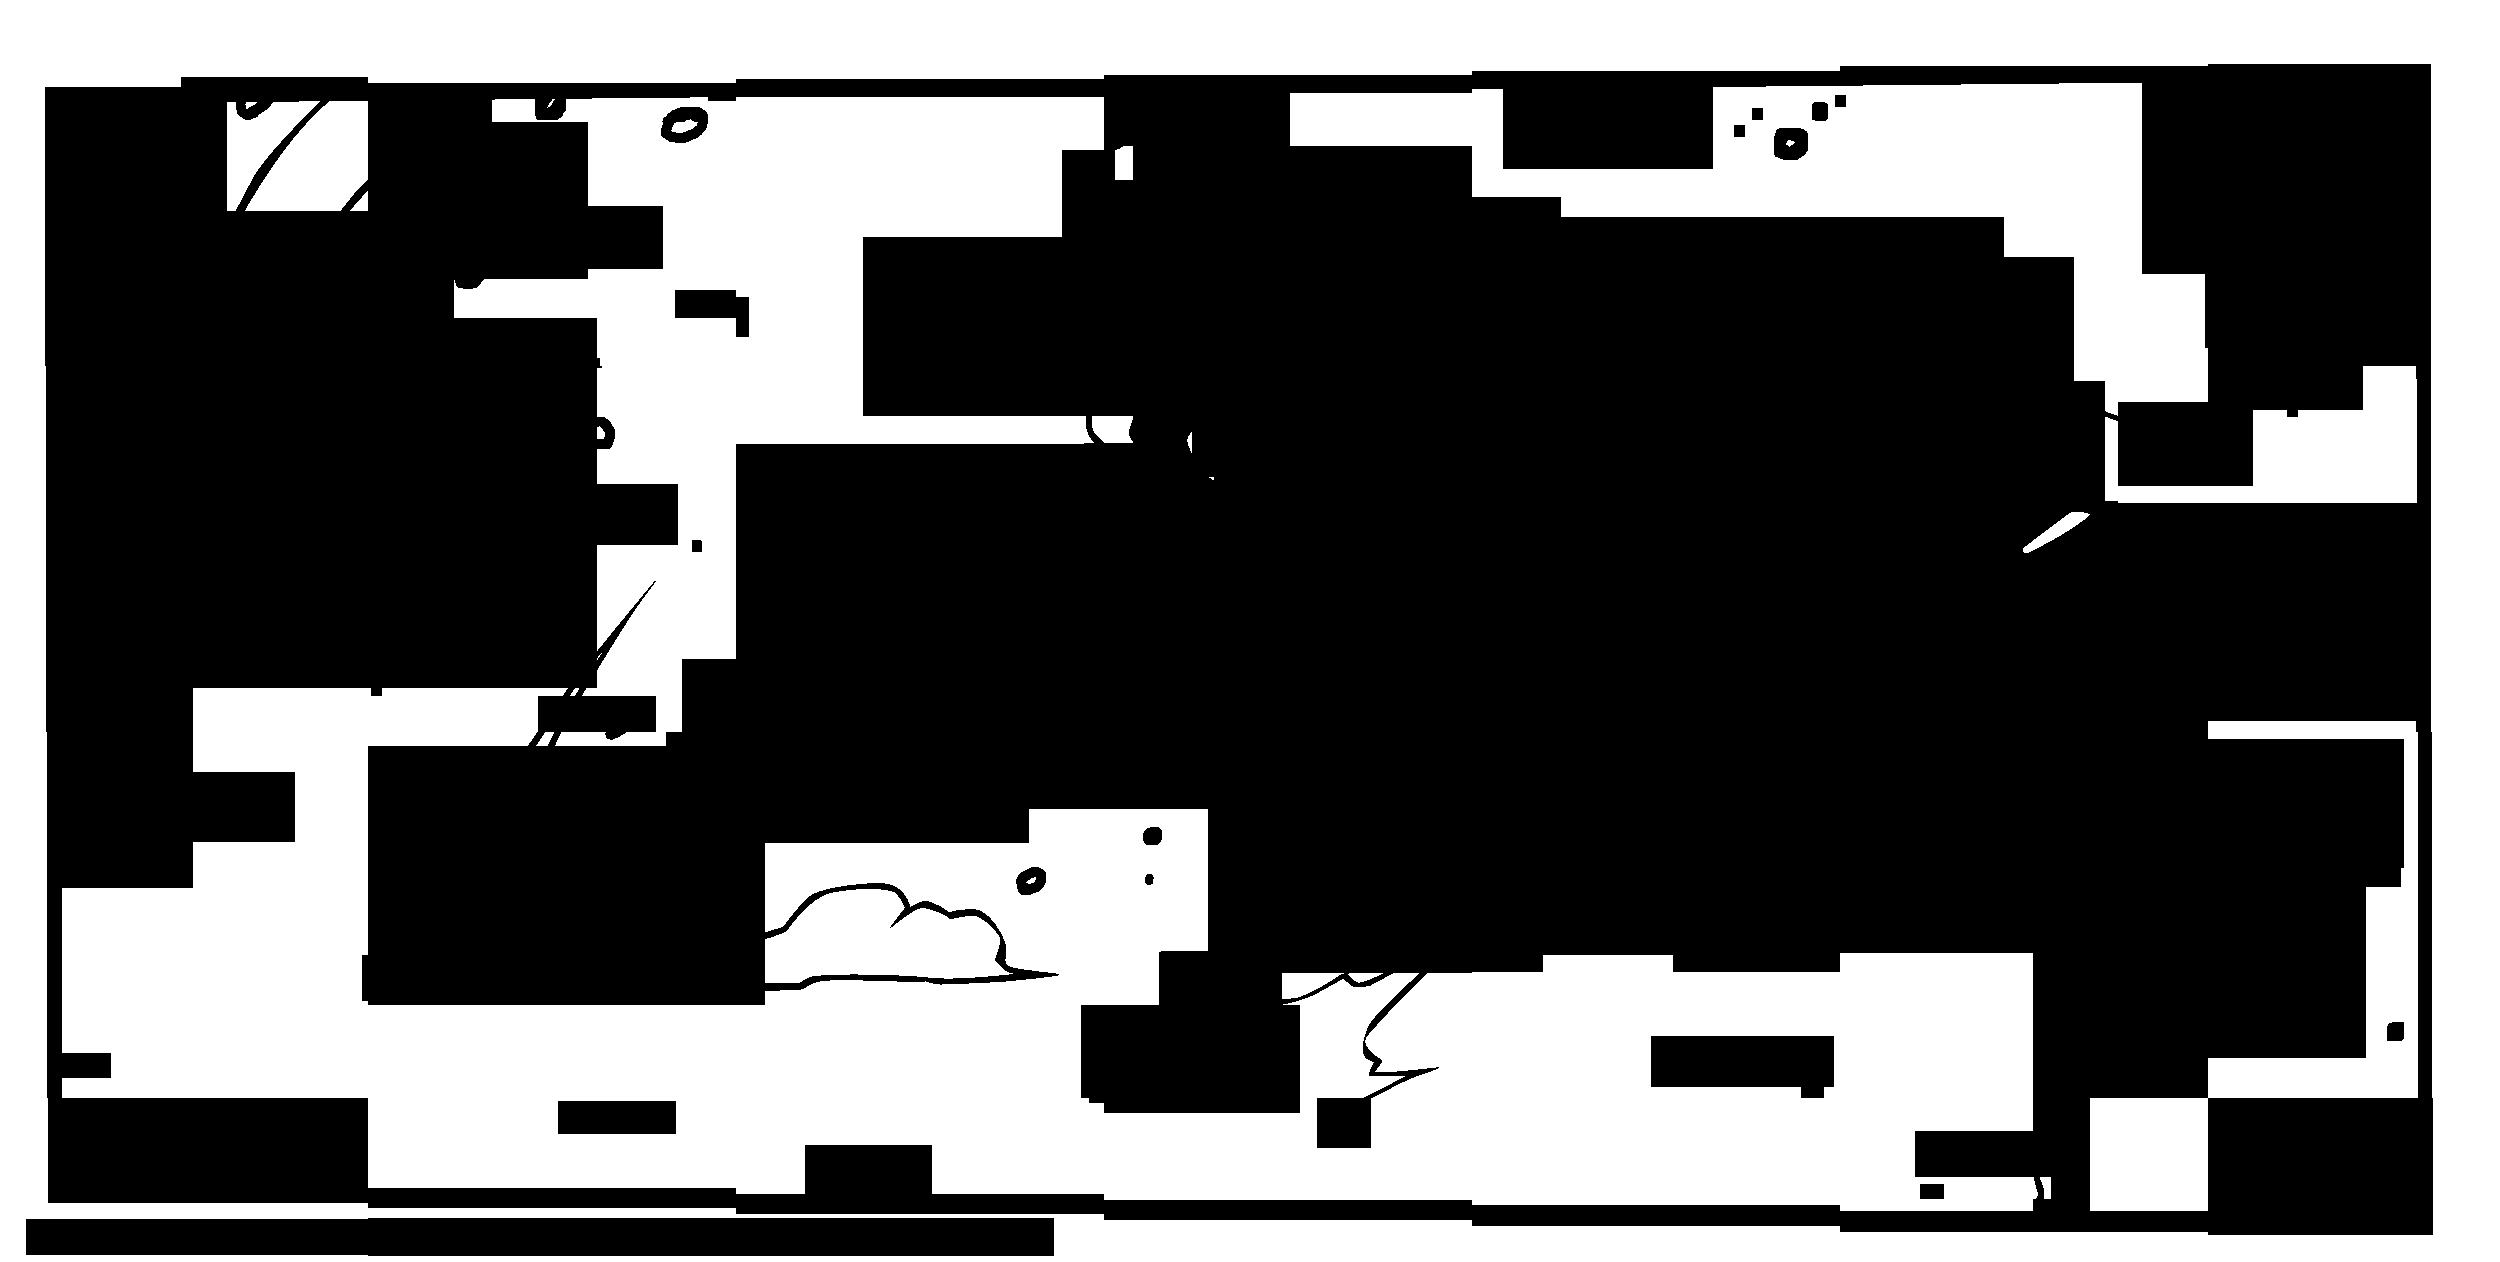 Natsu Lineart : Natsu lineart by dontlove on deviantart